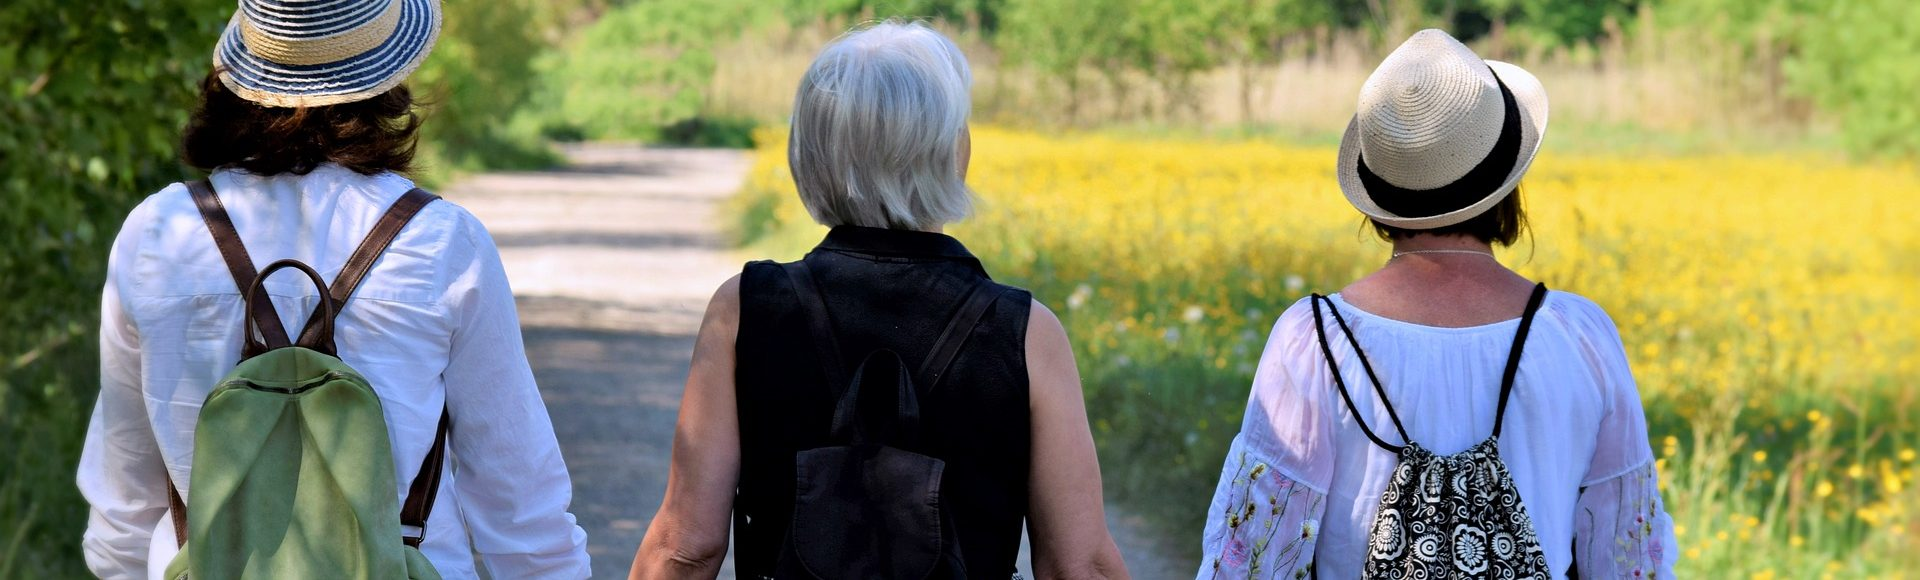 Osteopatia e menopausa